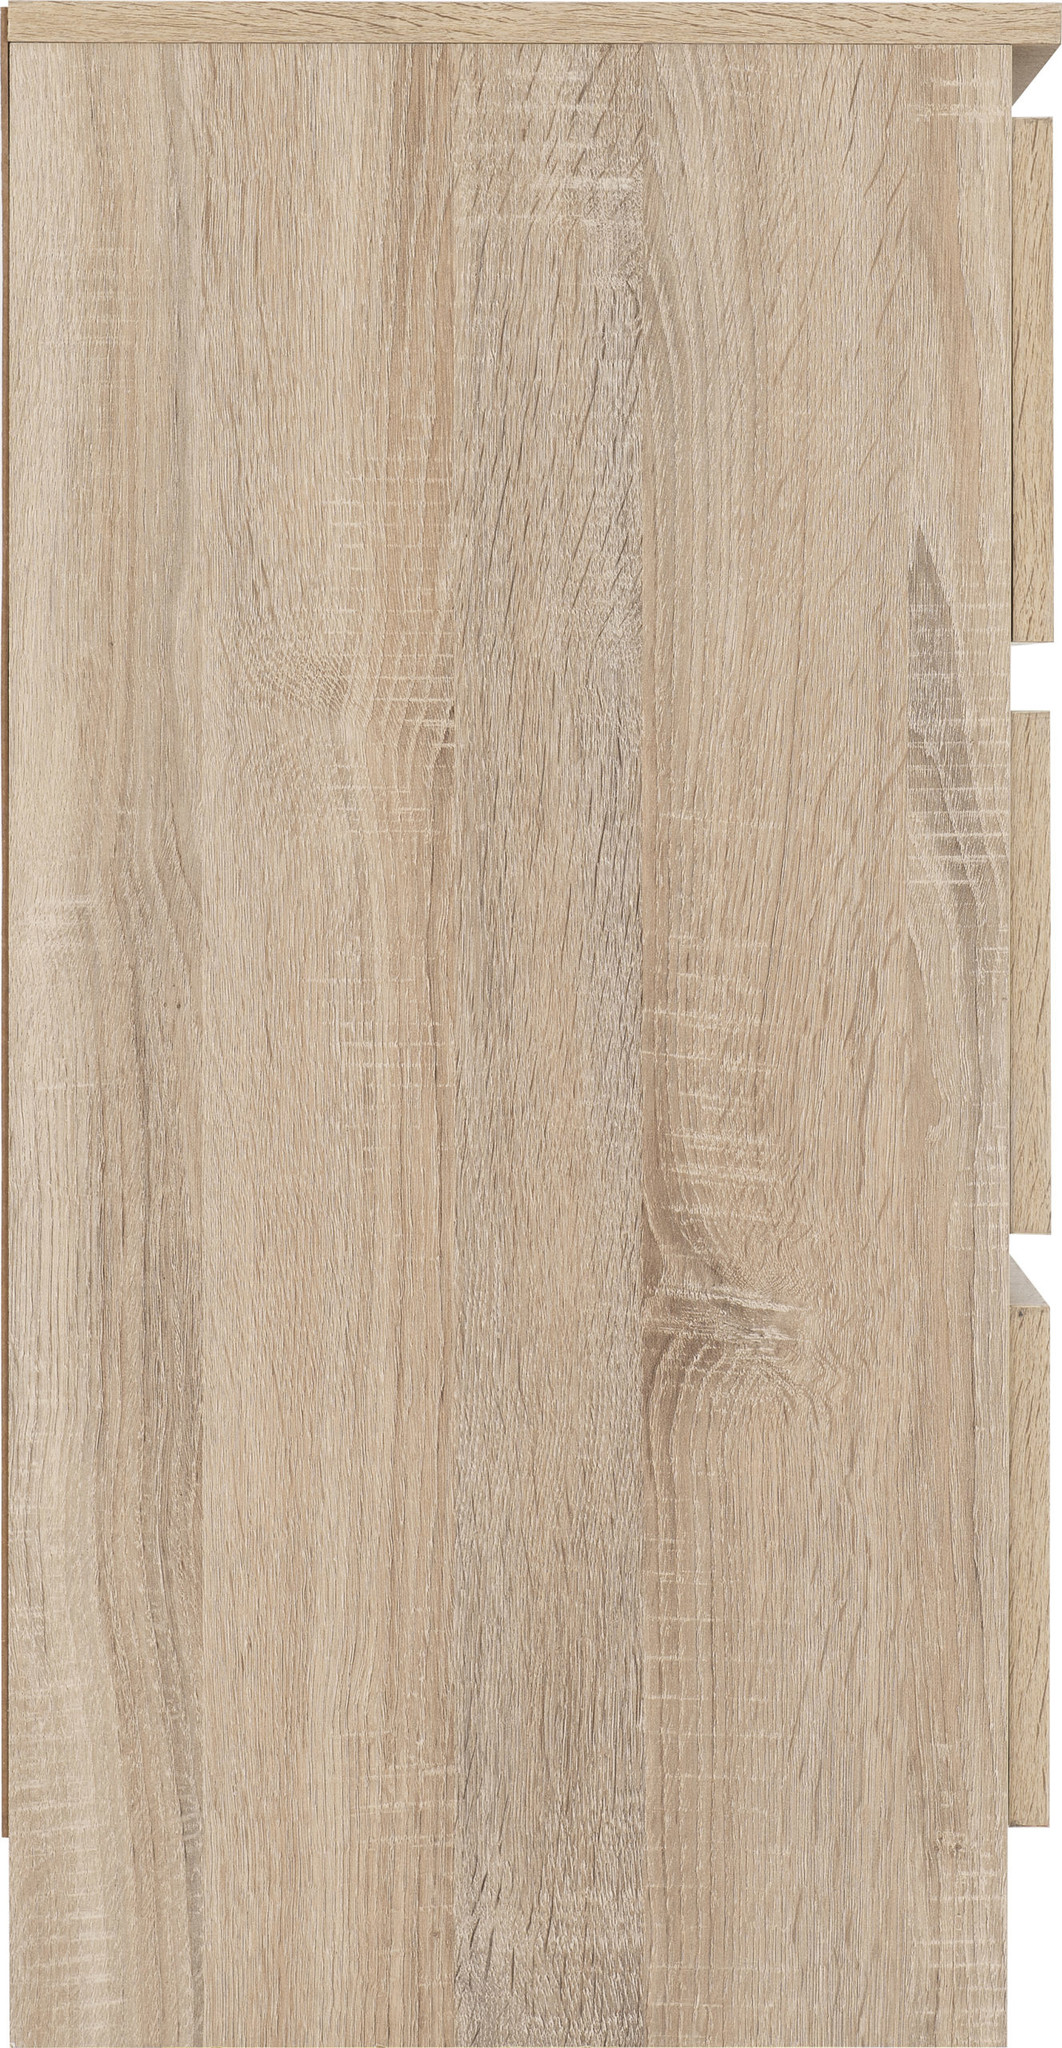 Sonoma Oak 6 Drawer Chest